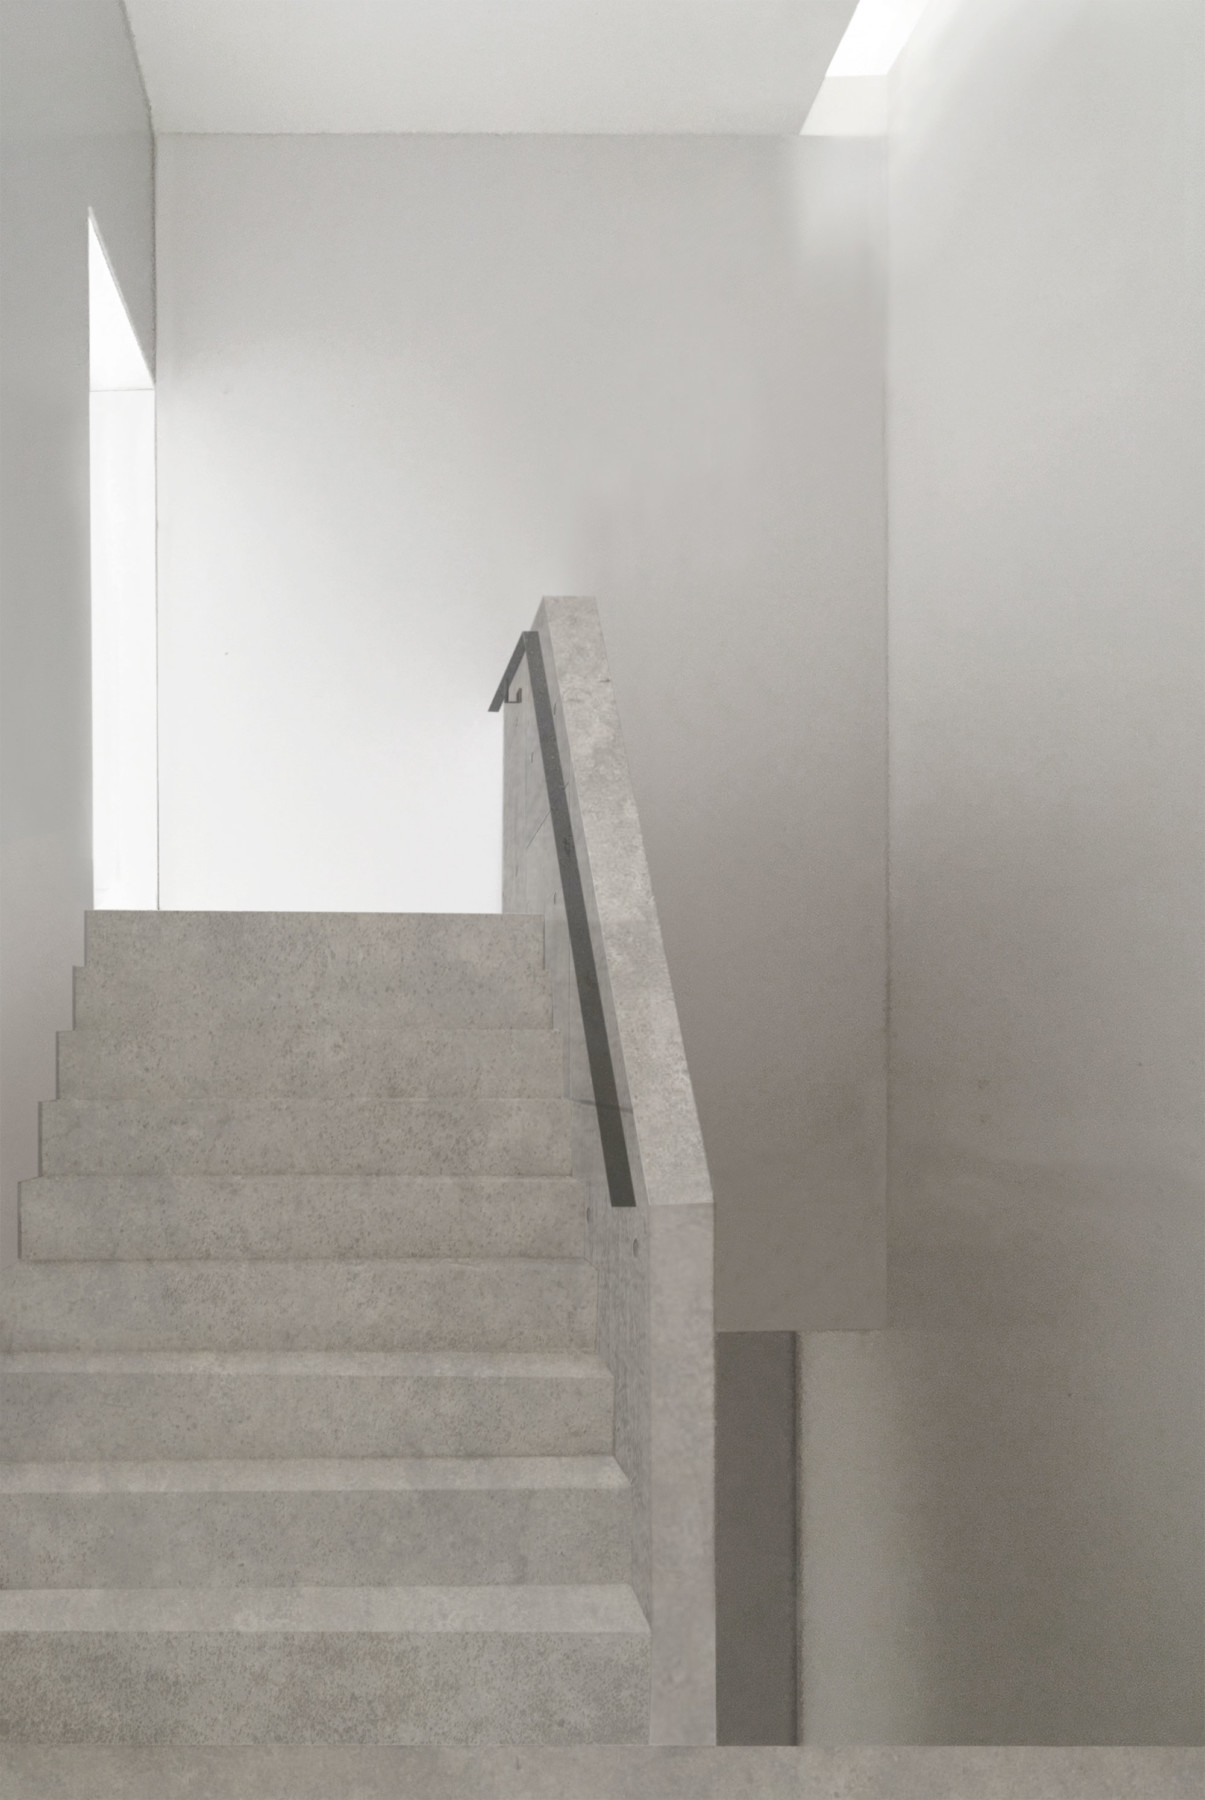 Jamie-fobert-architects-house-in-primrose-hill-concrete-stair-interior-visual